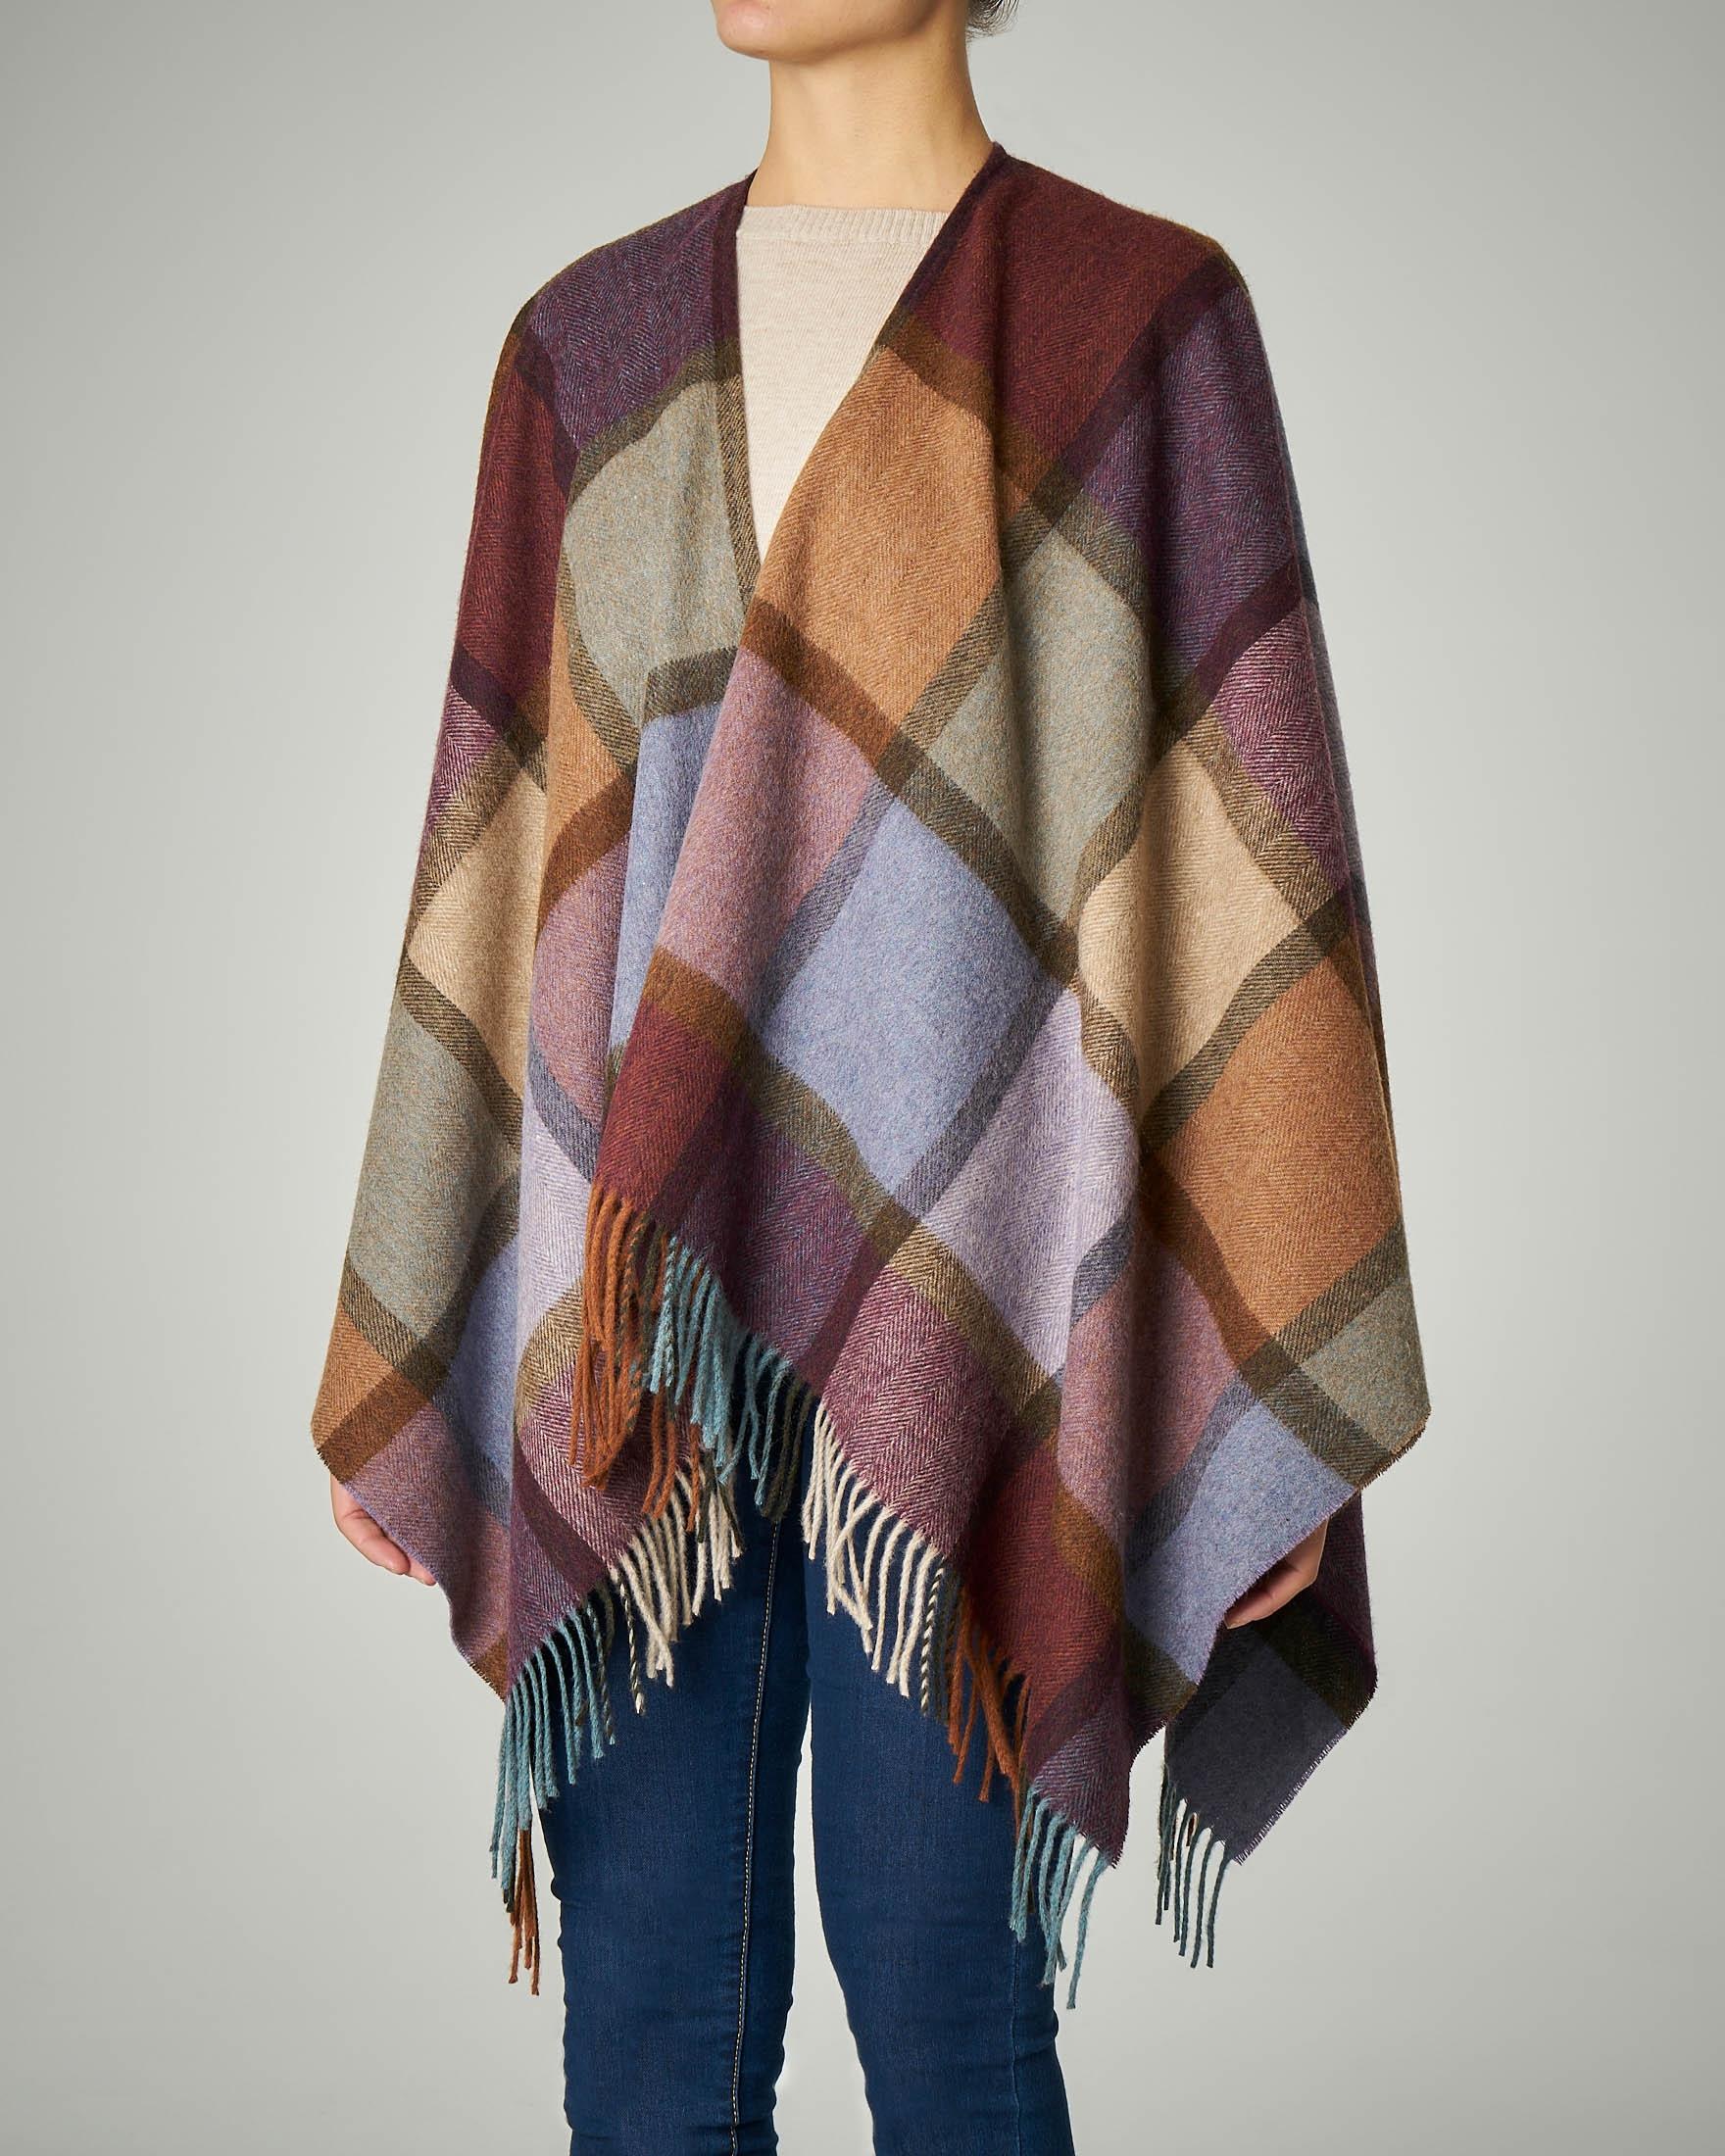 Poncho in lana merino a fantasia tartan multicolor con frange